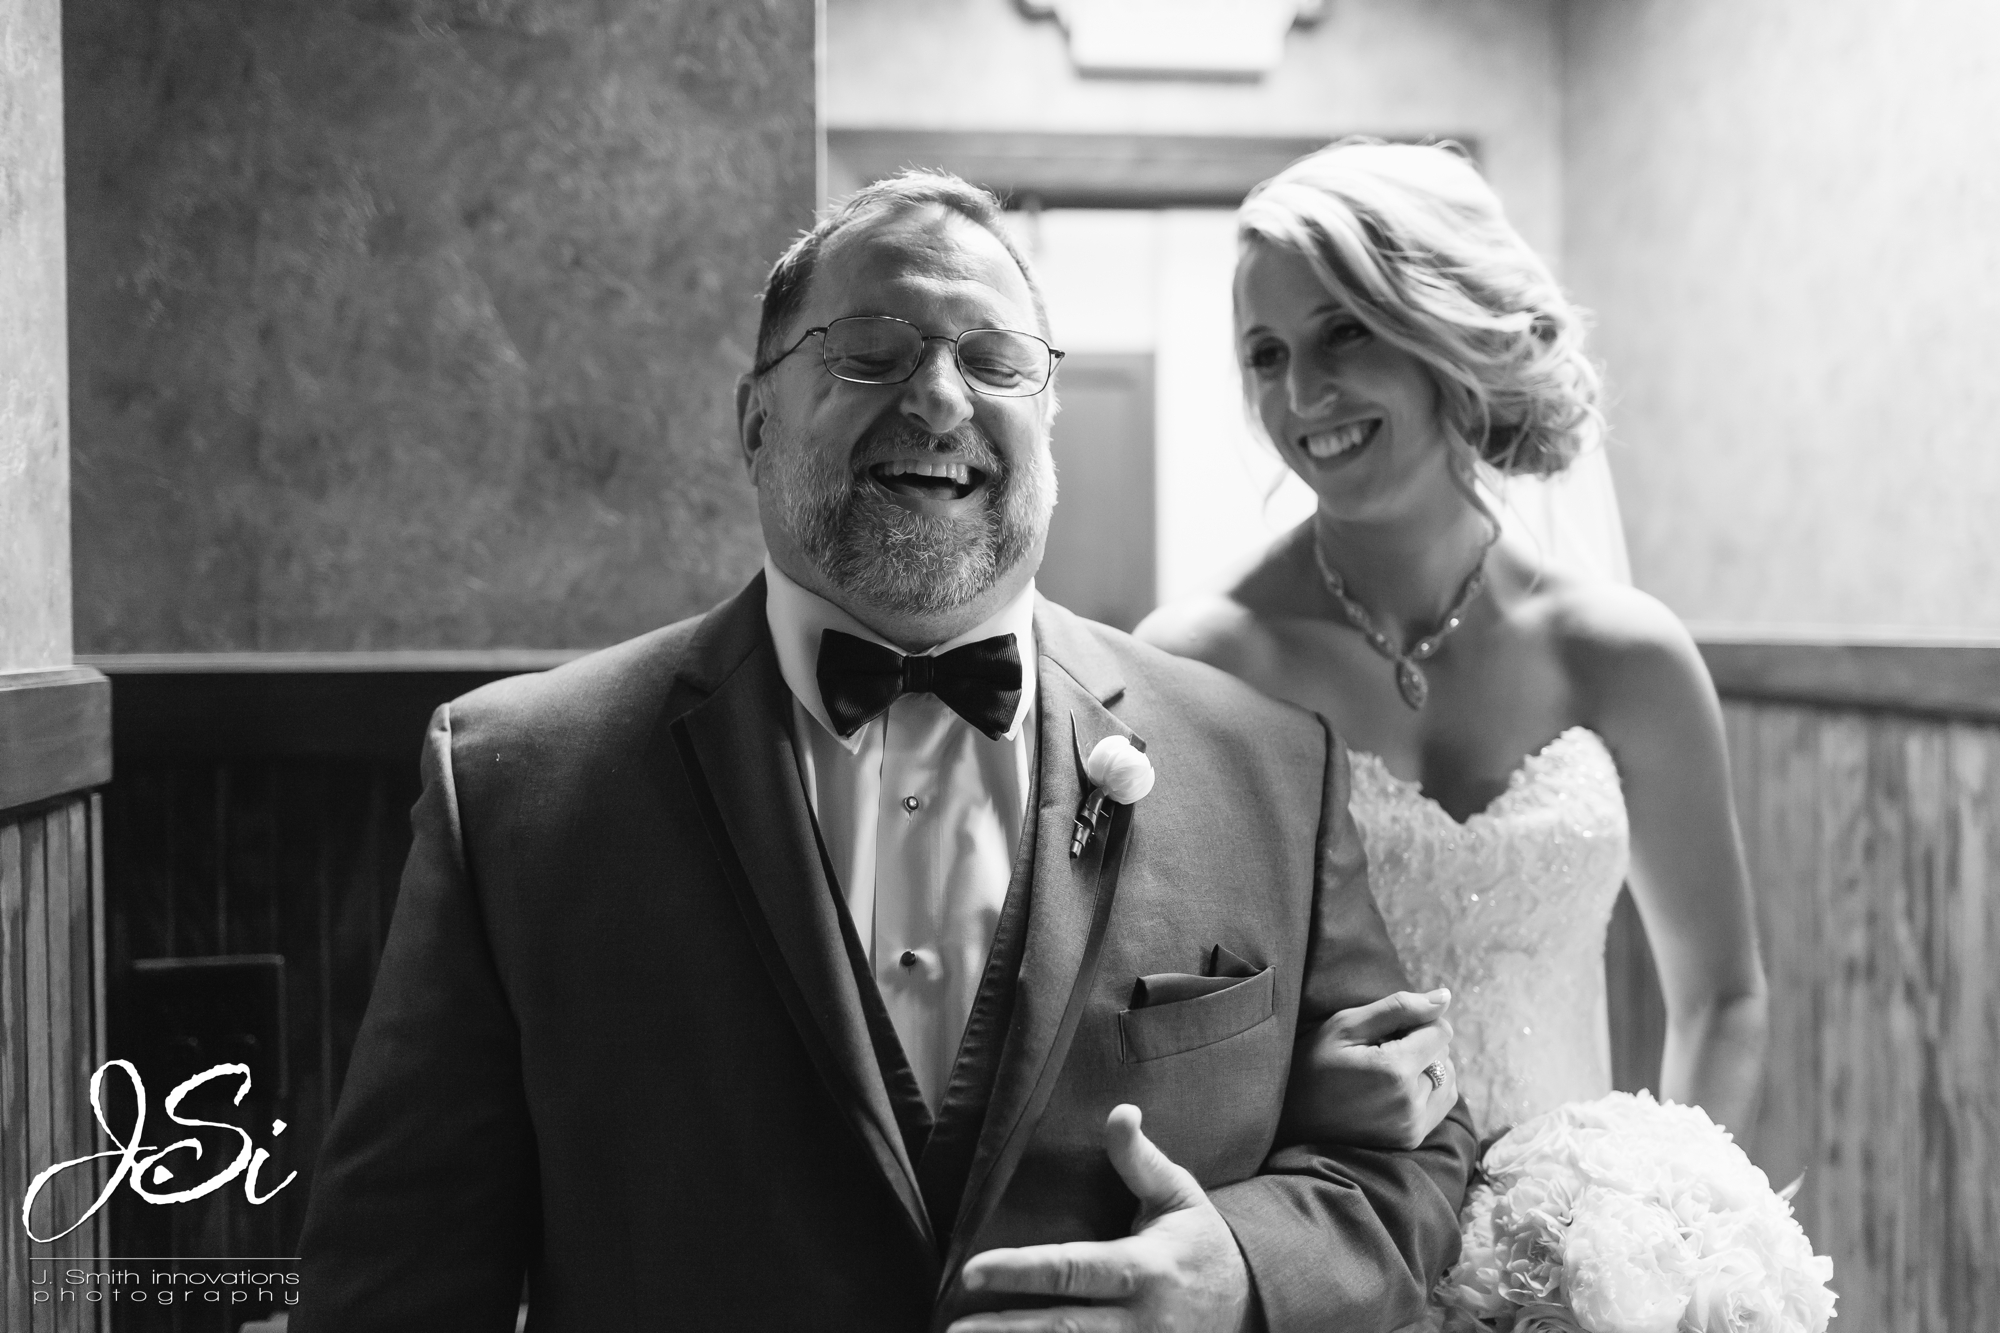 Kansas City husband wife wedding photographer team photo blog father bride laughing photo